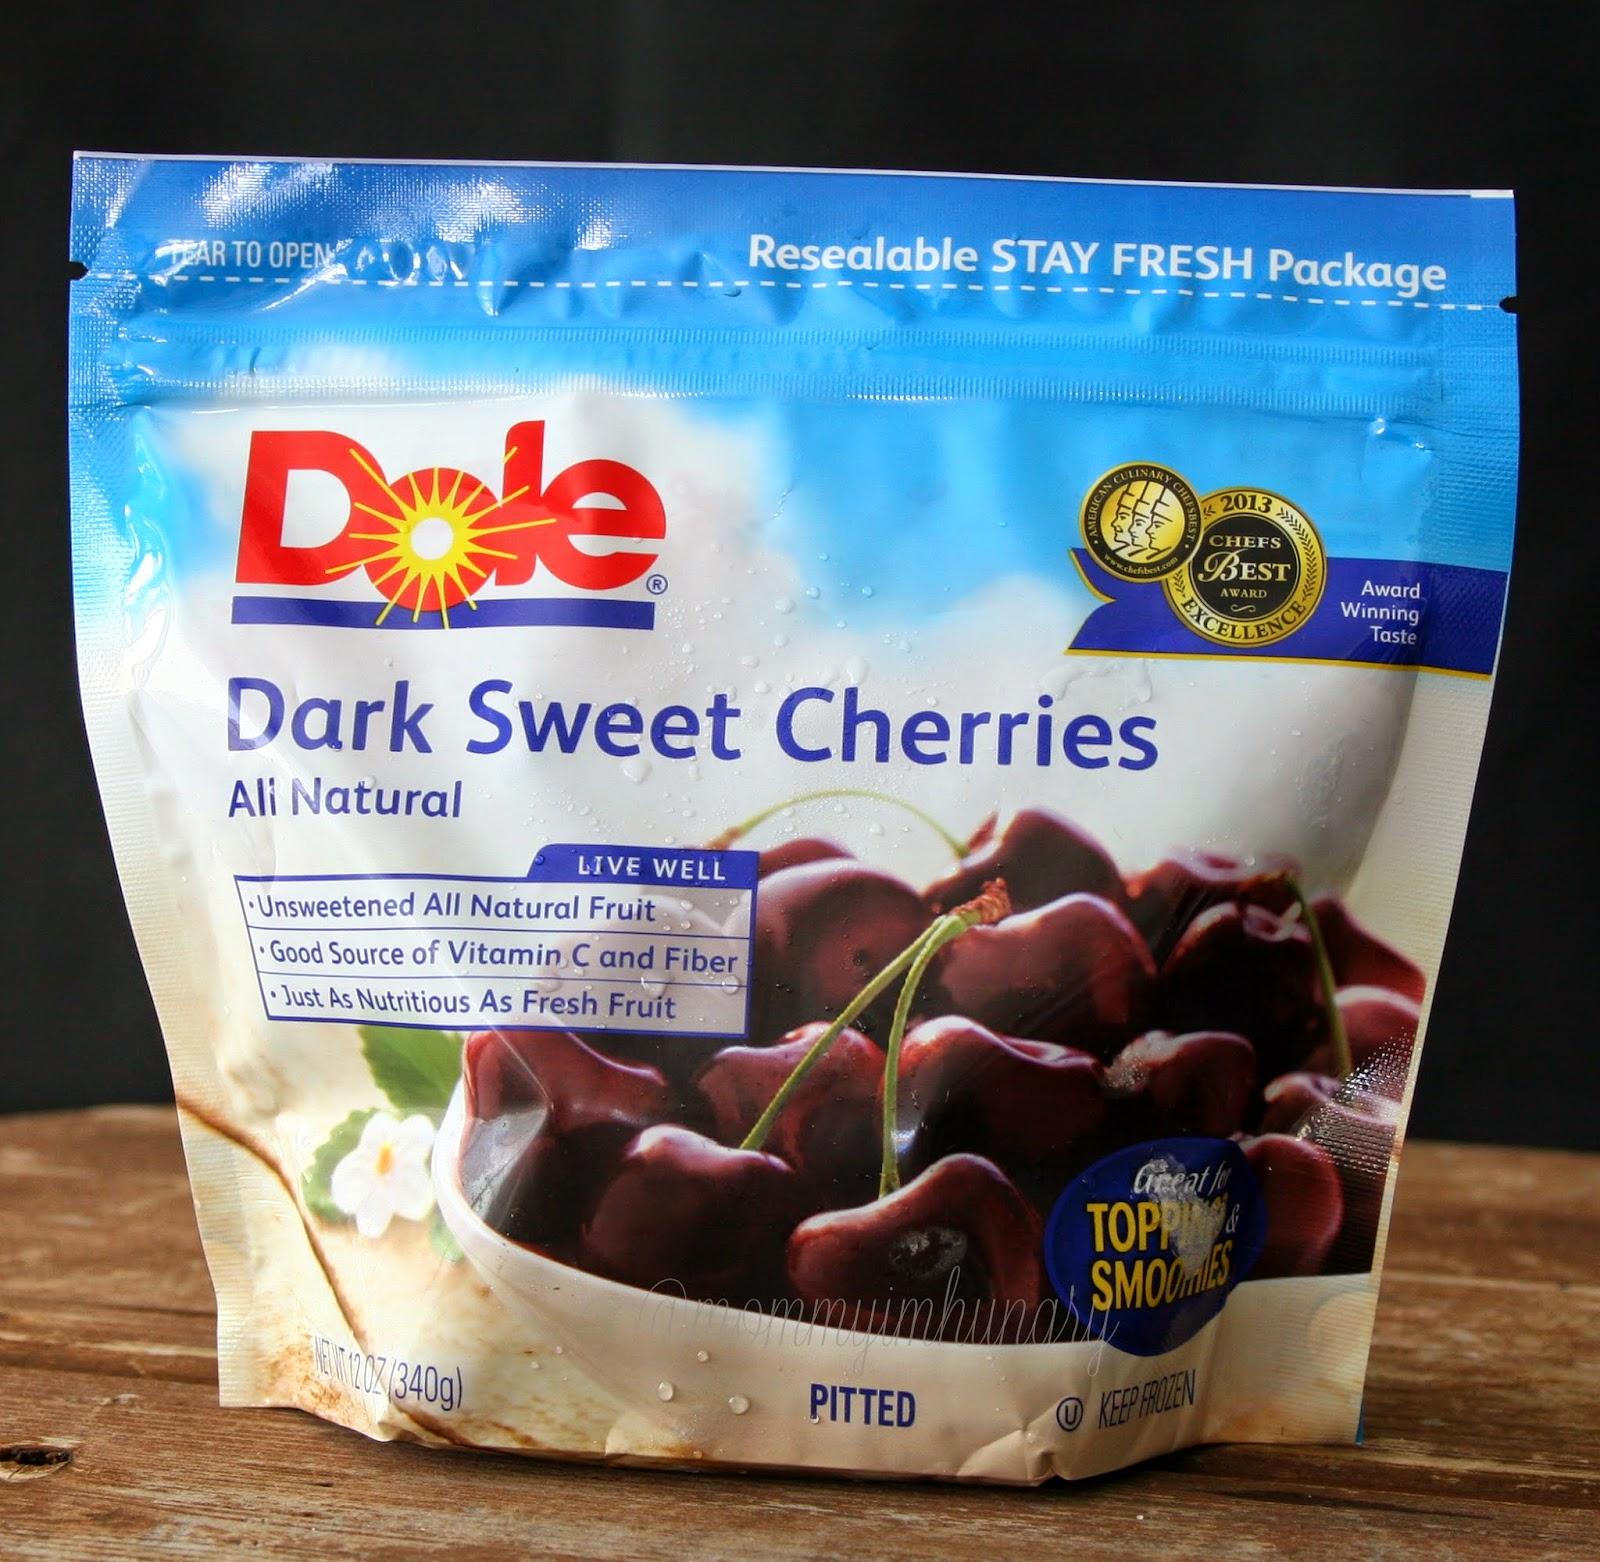 dole cherry crumble cake & chocolate brownie cherry ice cream #teamdole #getfrozen